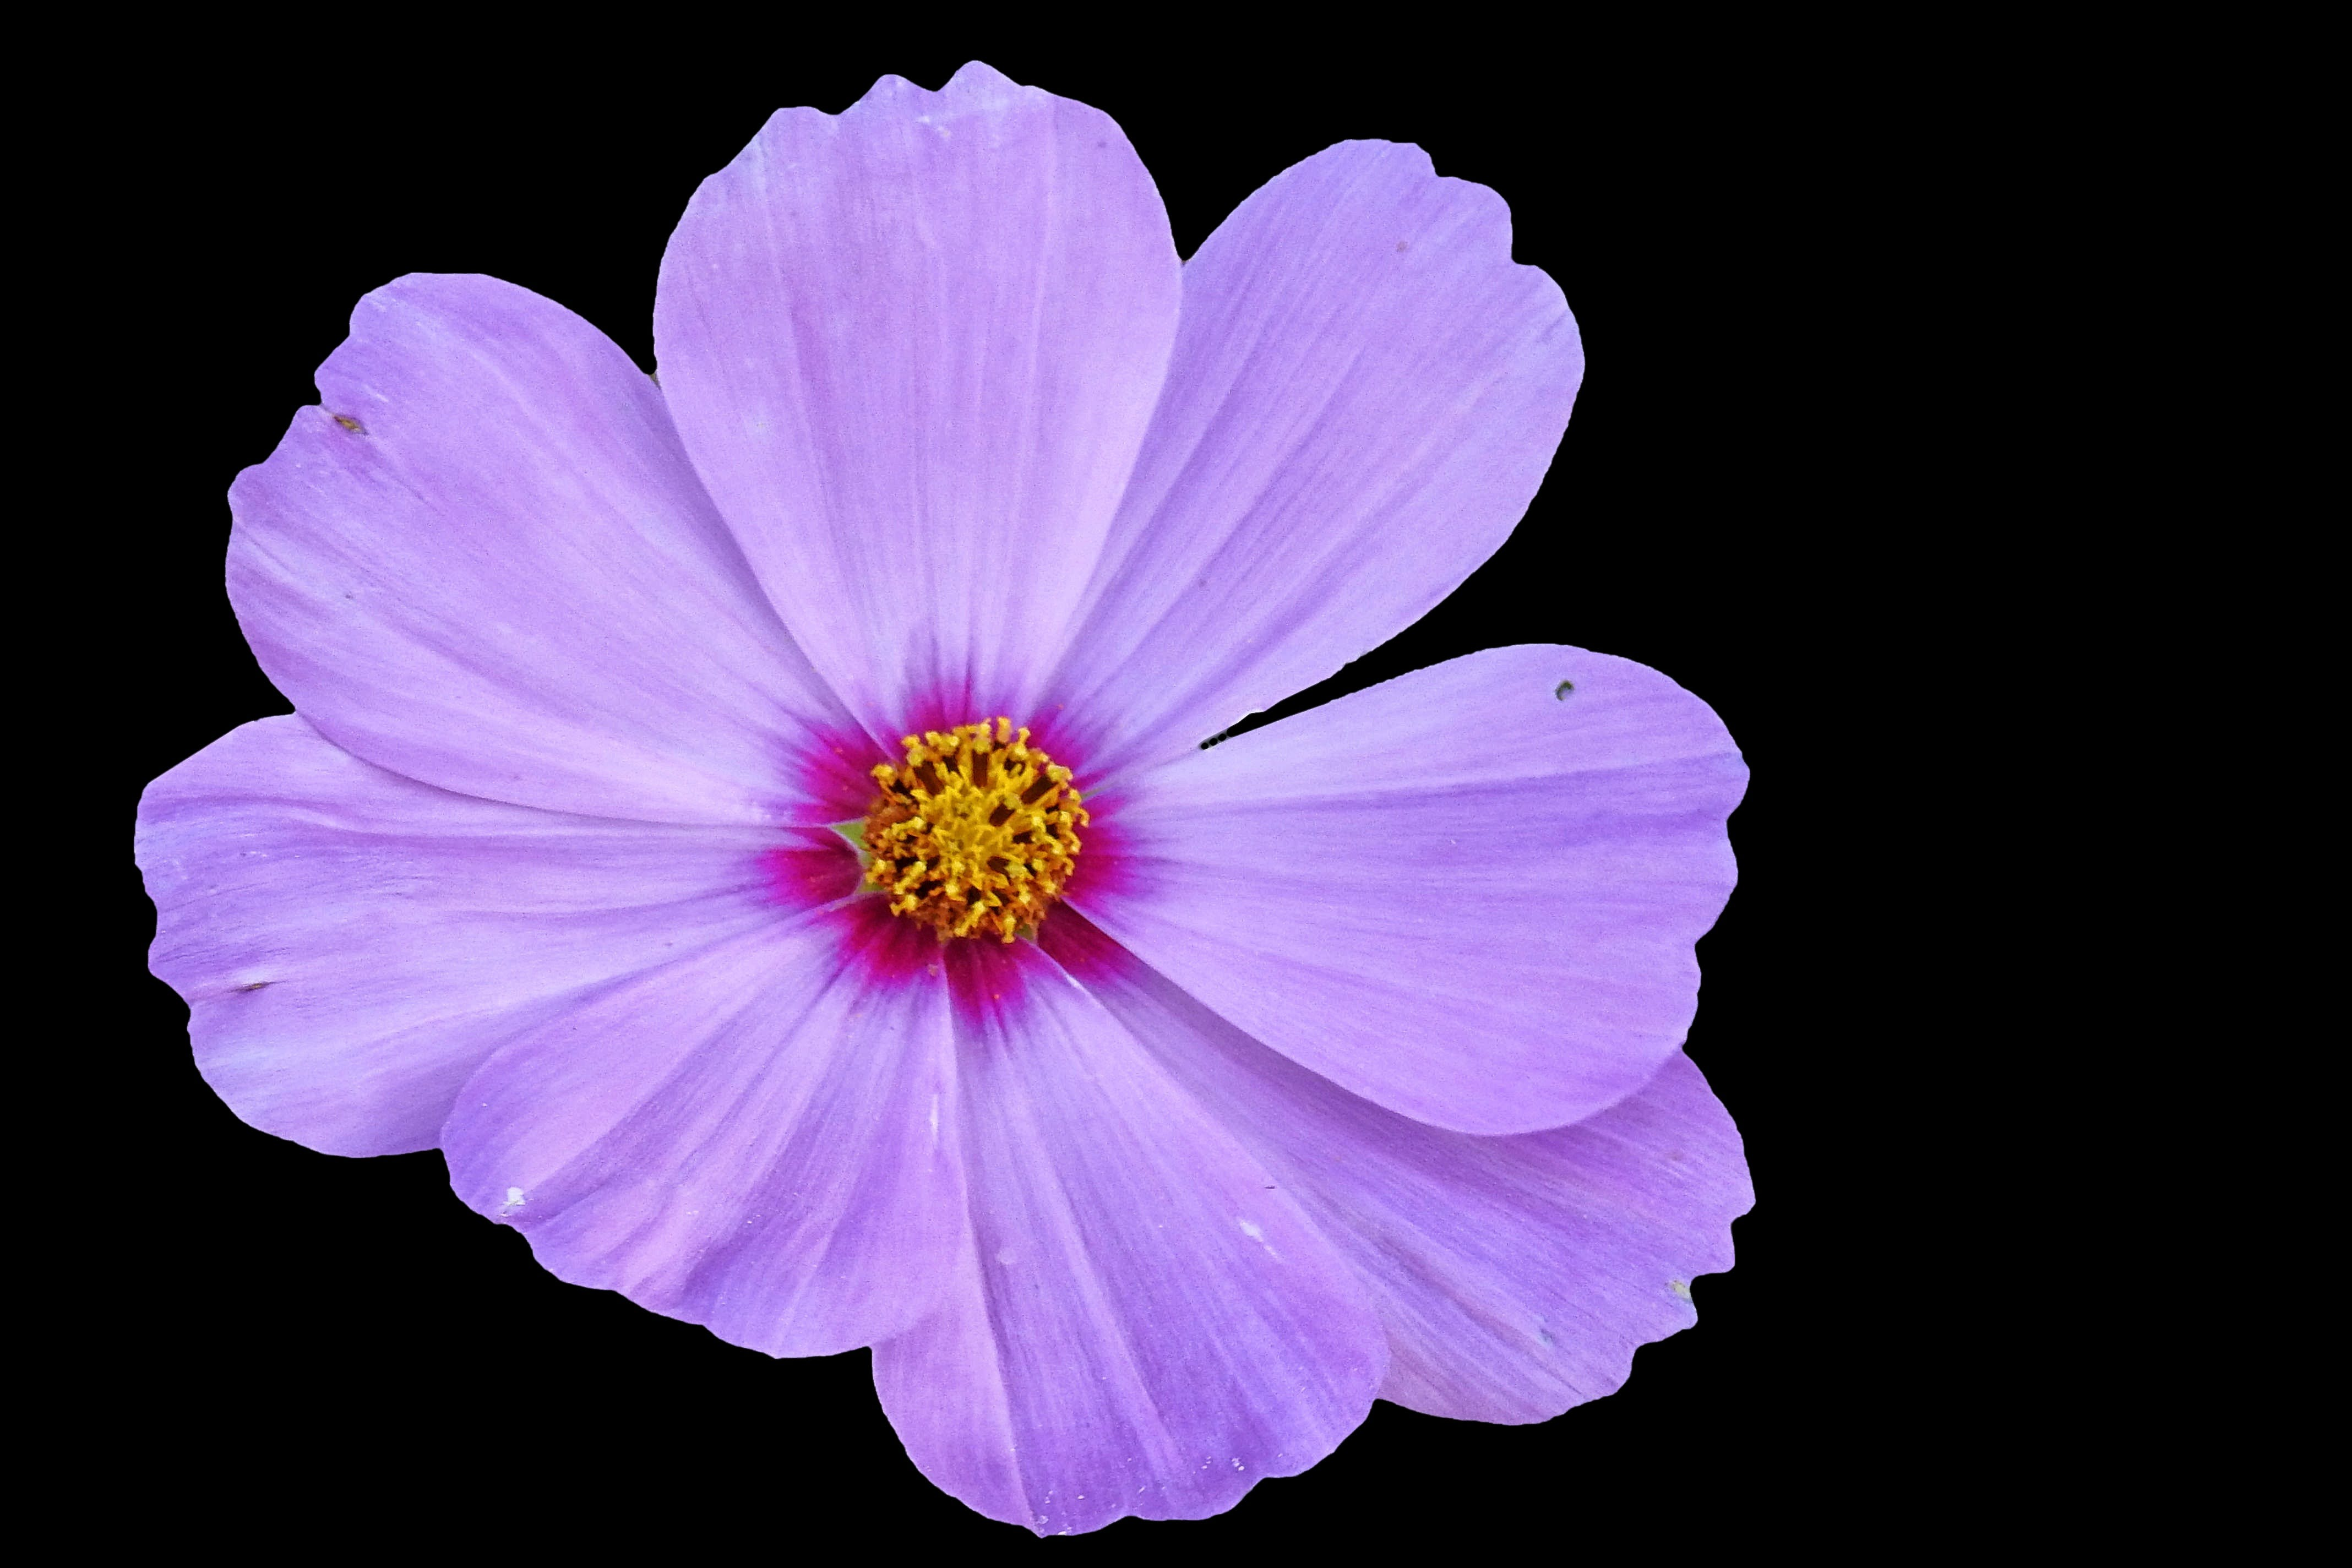 Free stock photo of summer, garden, flower, bloom